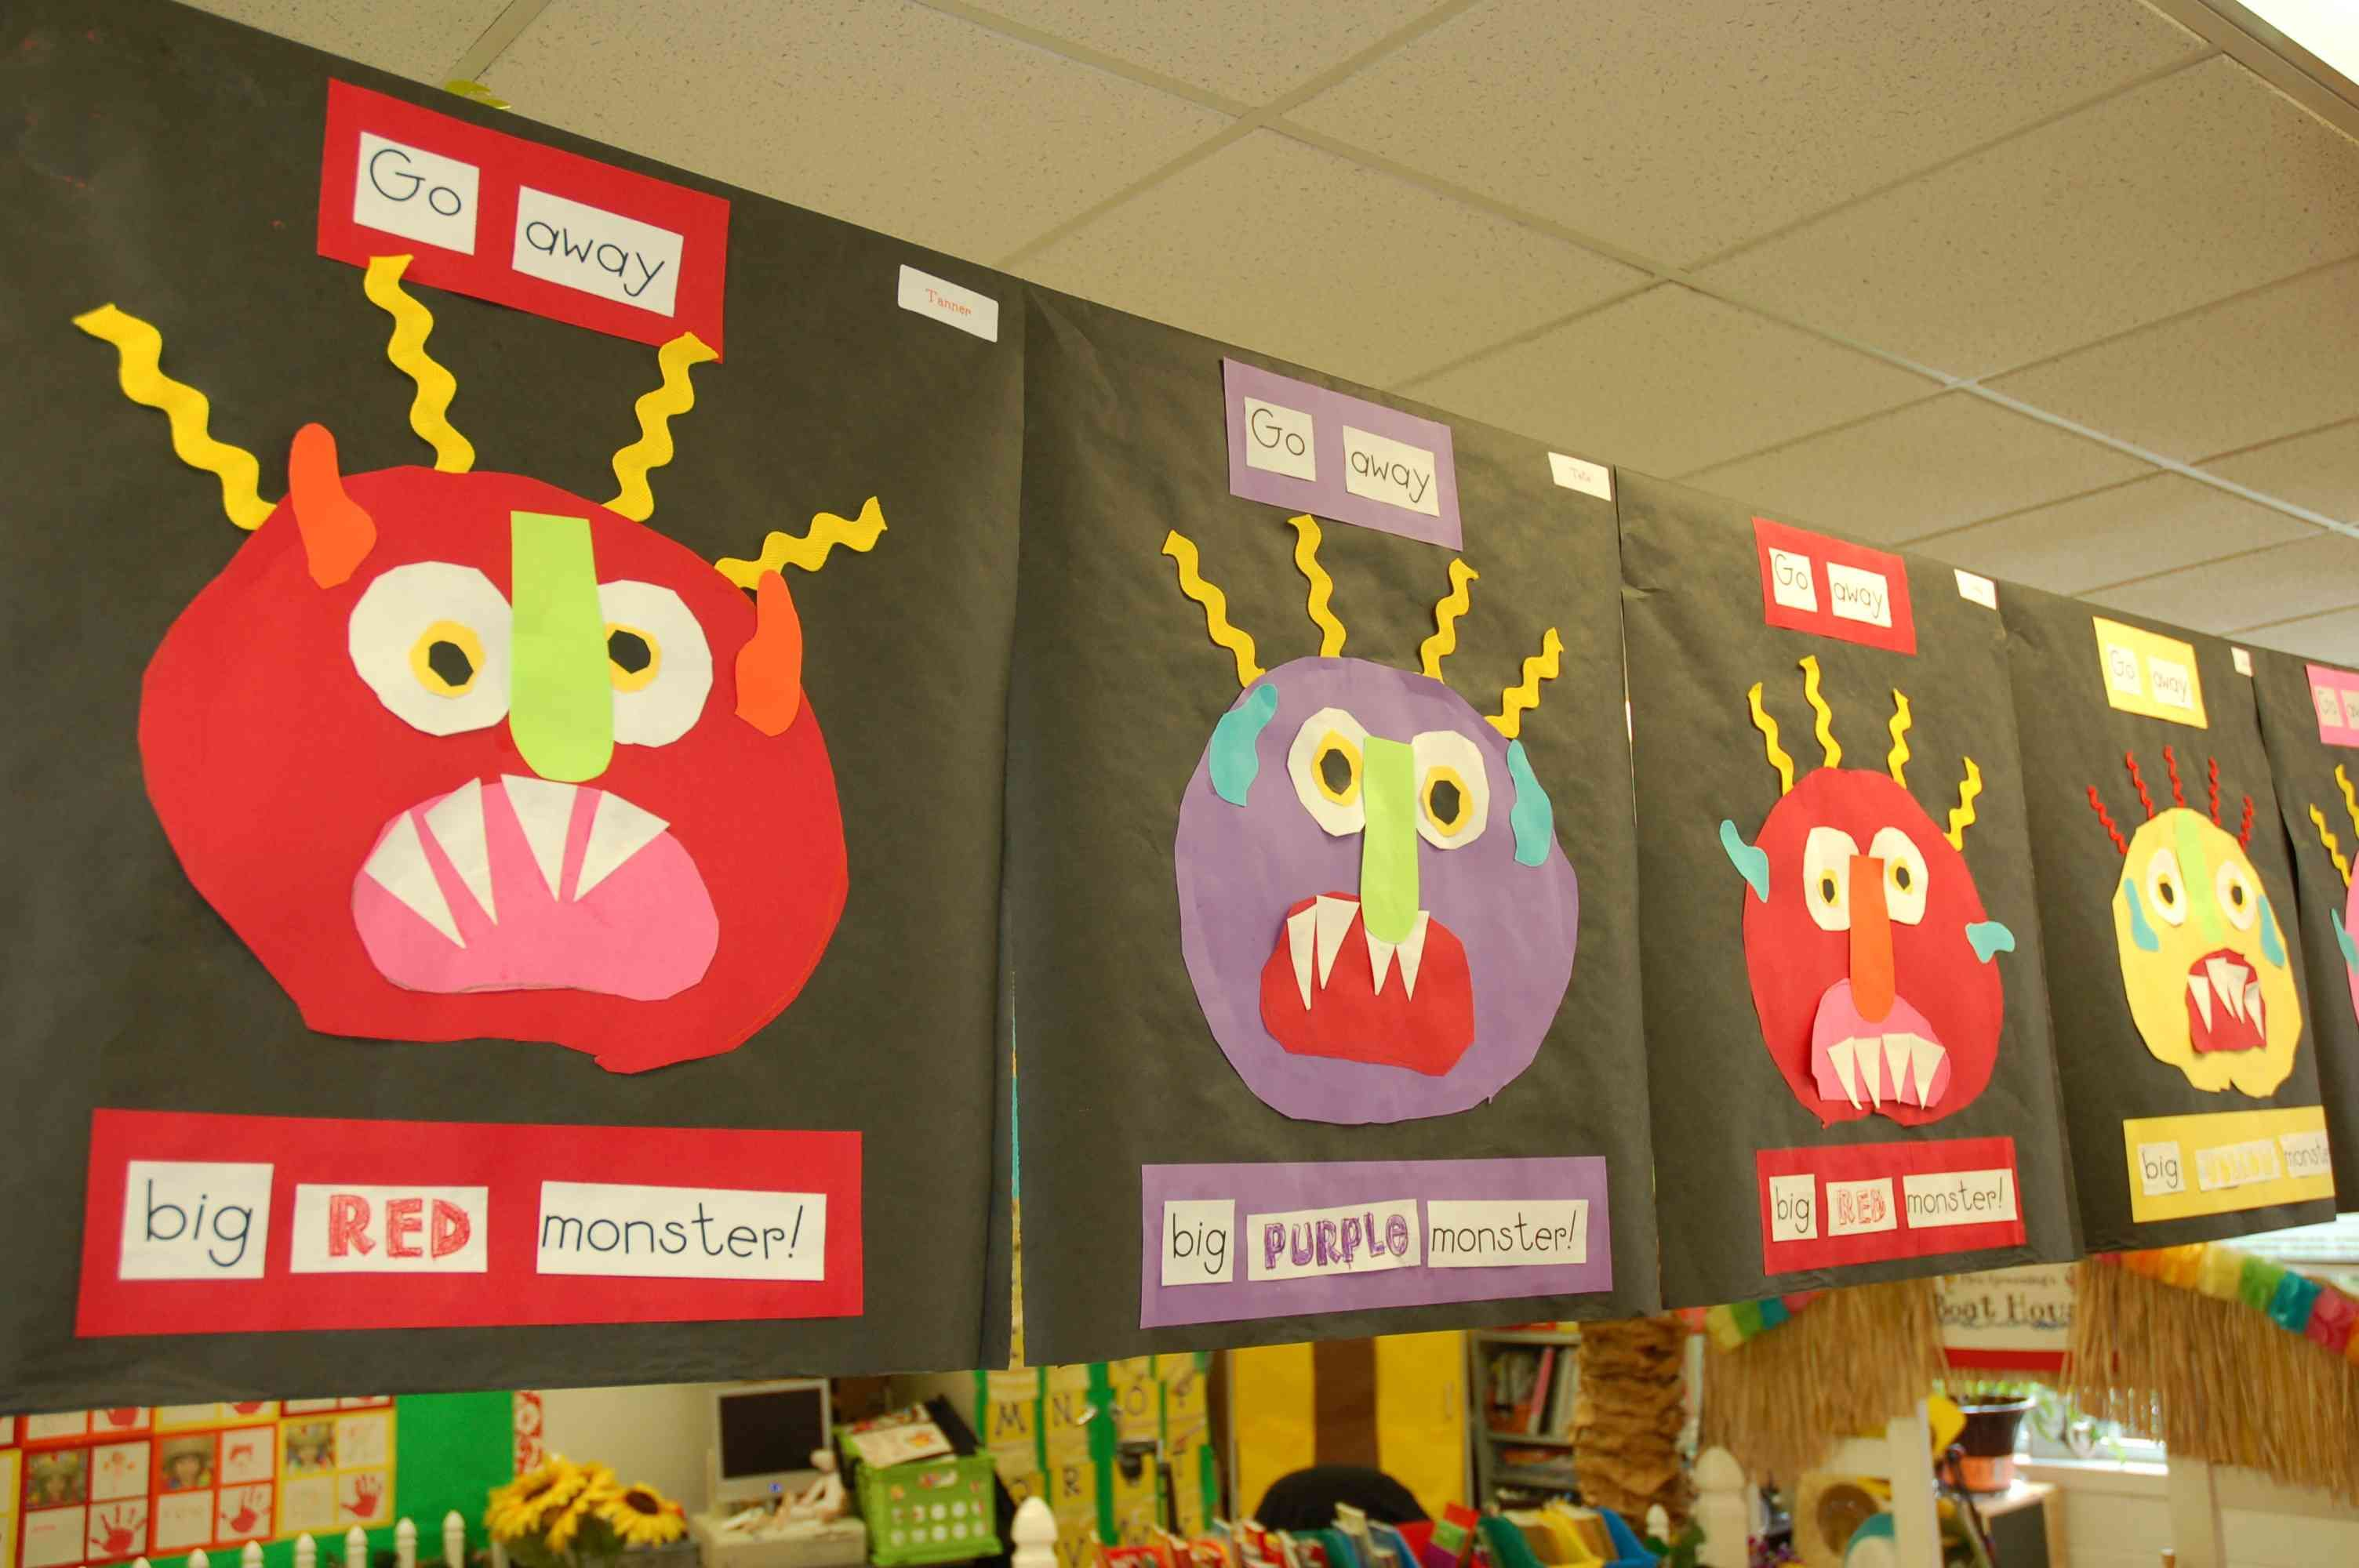 Microsoft Onedrive Access Files Anywhere Create Docs With Free Office Online Big Green Monster Halloween Preschool Kindergarten Art